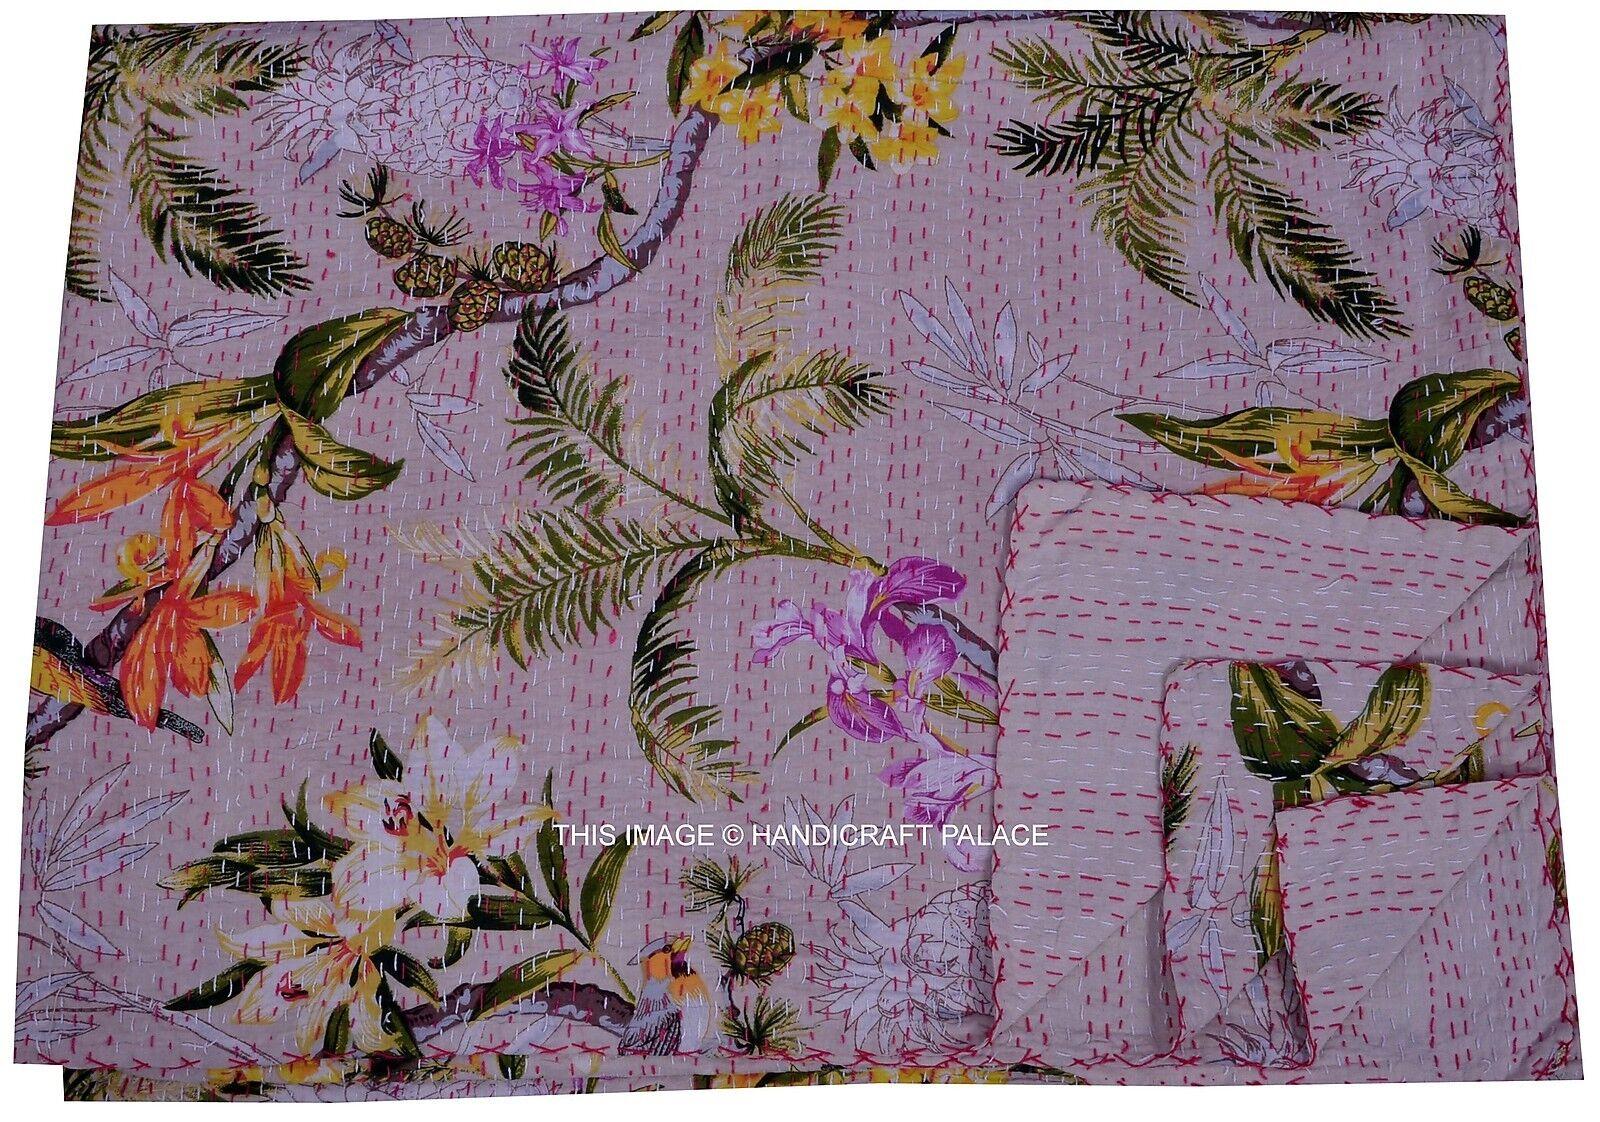 Vintage Indian Art Kantha Quilt Throw Floral Printed Bedspread Ethnic Decorative